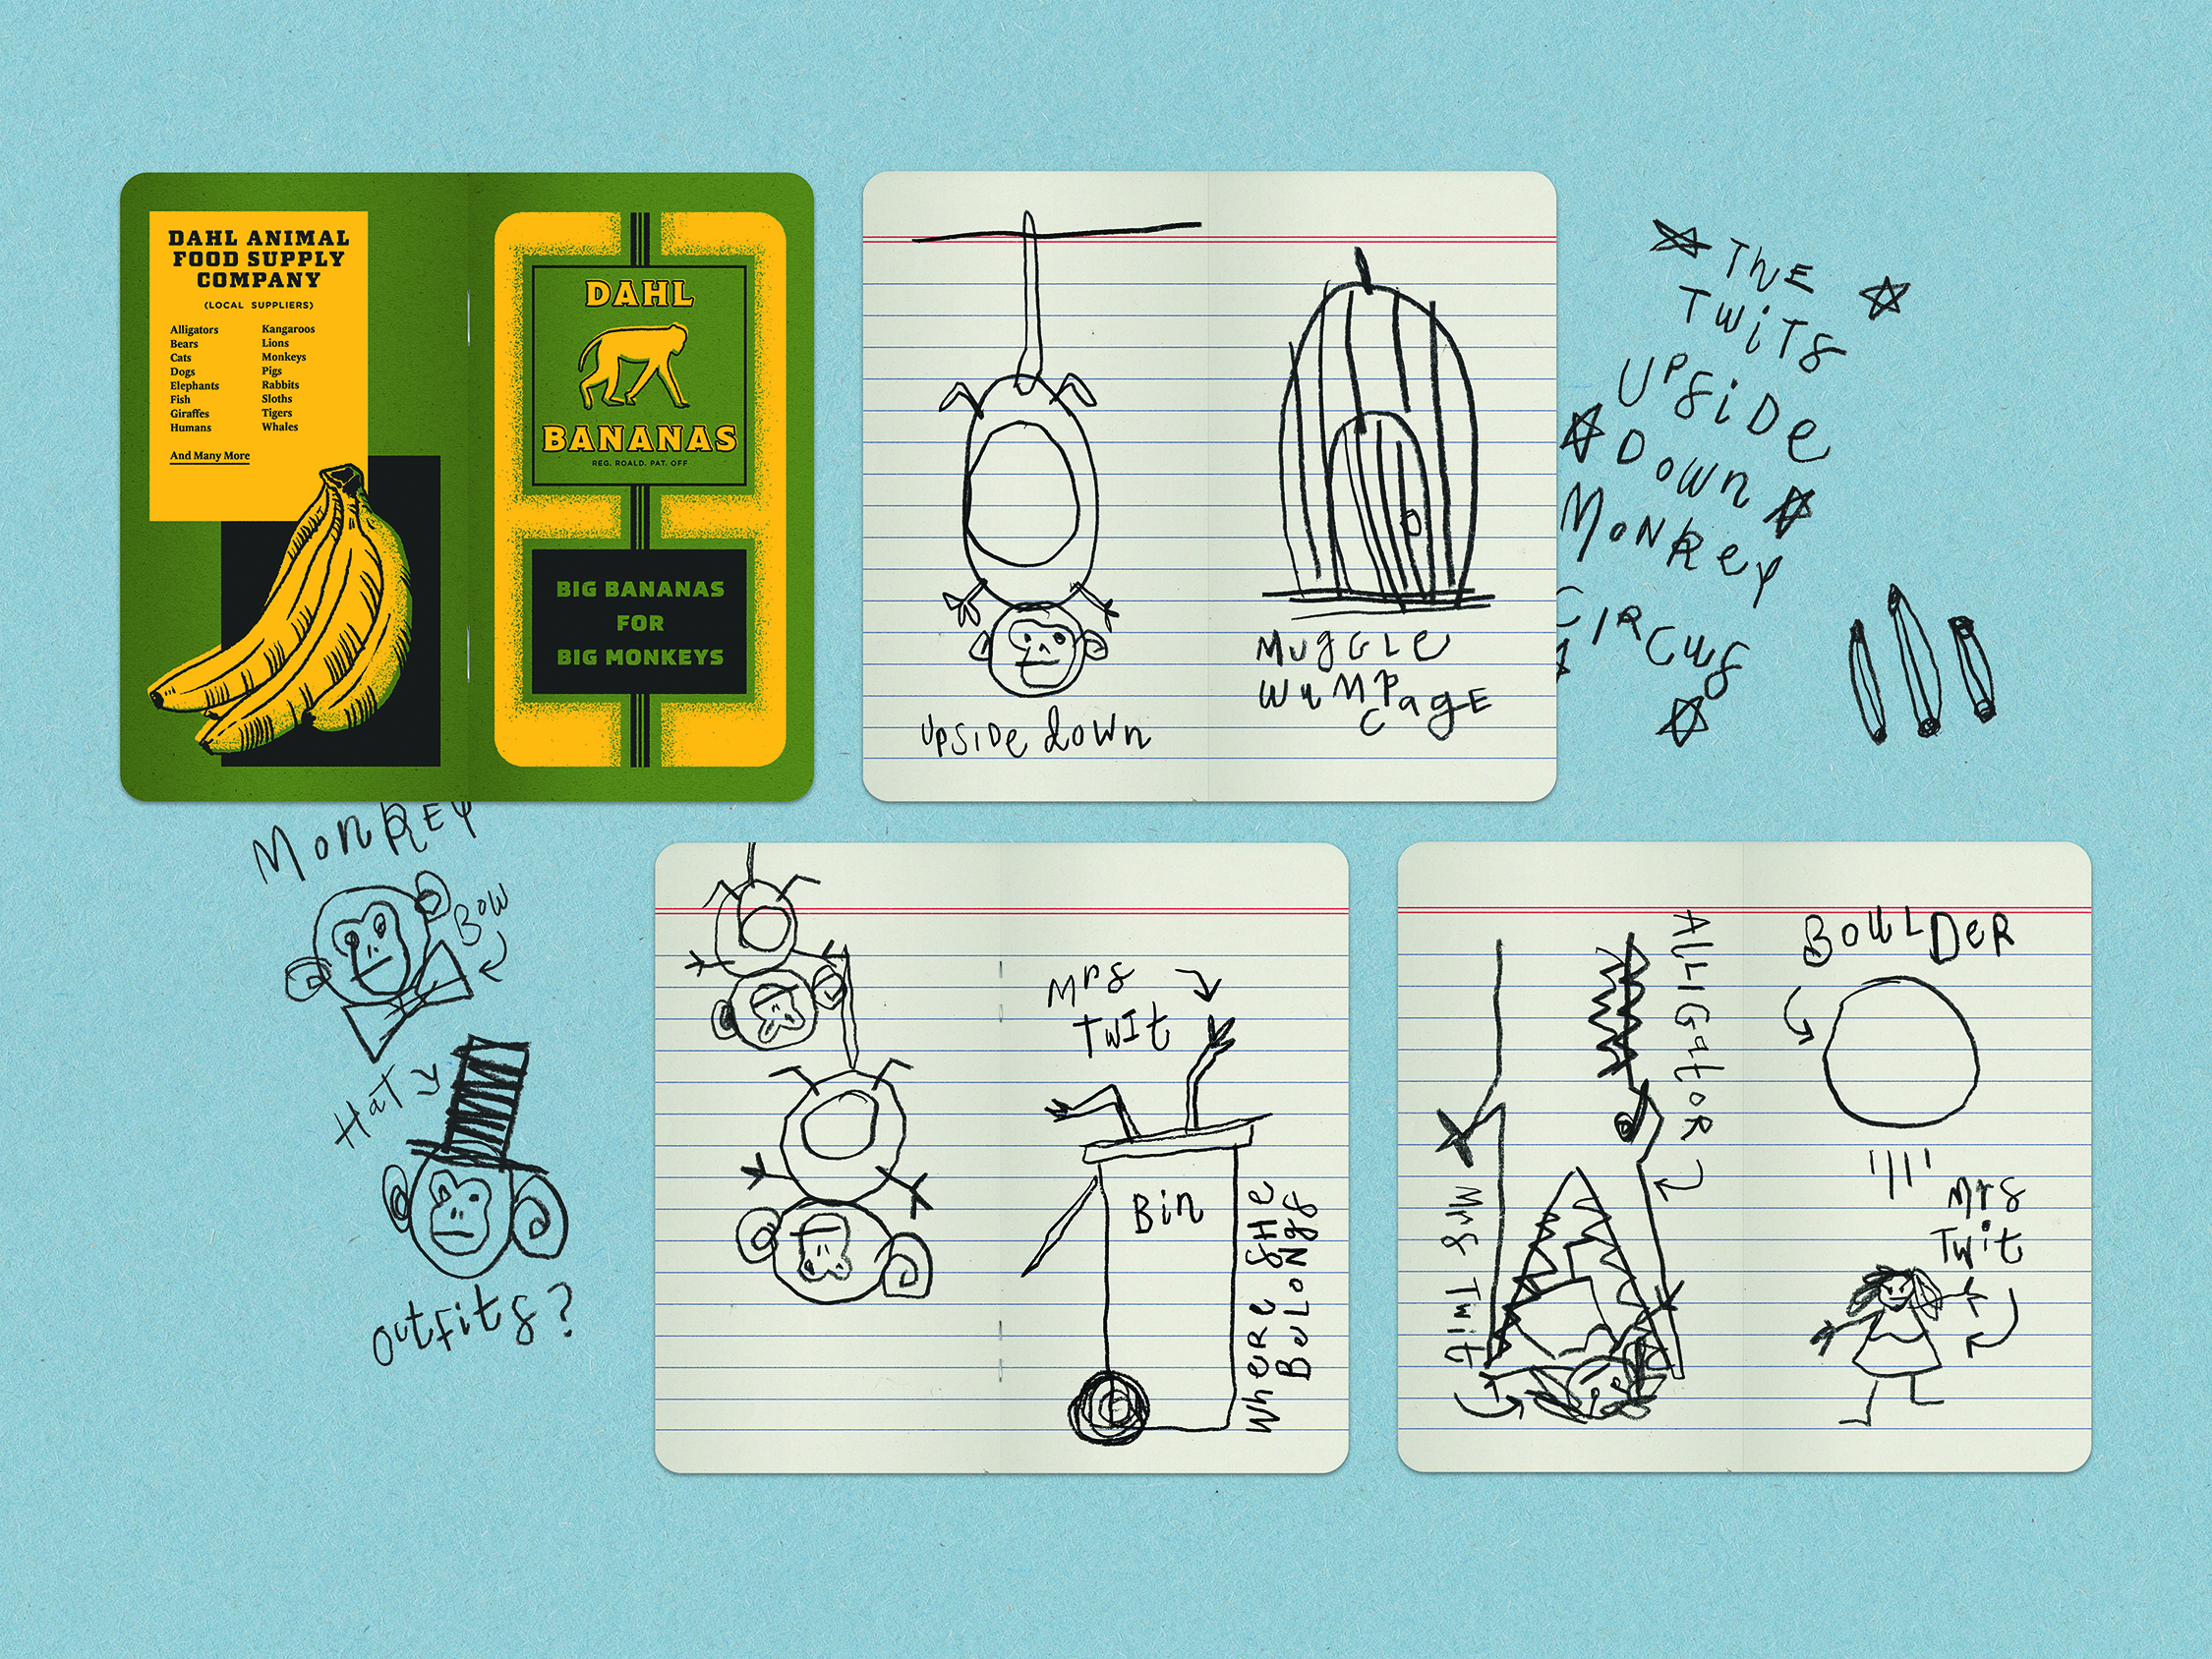 Mr. Twit's Notebook